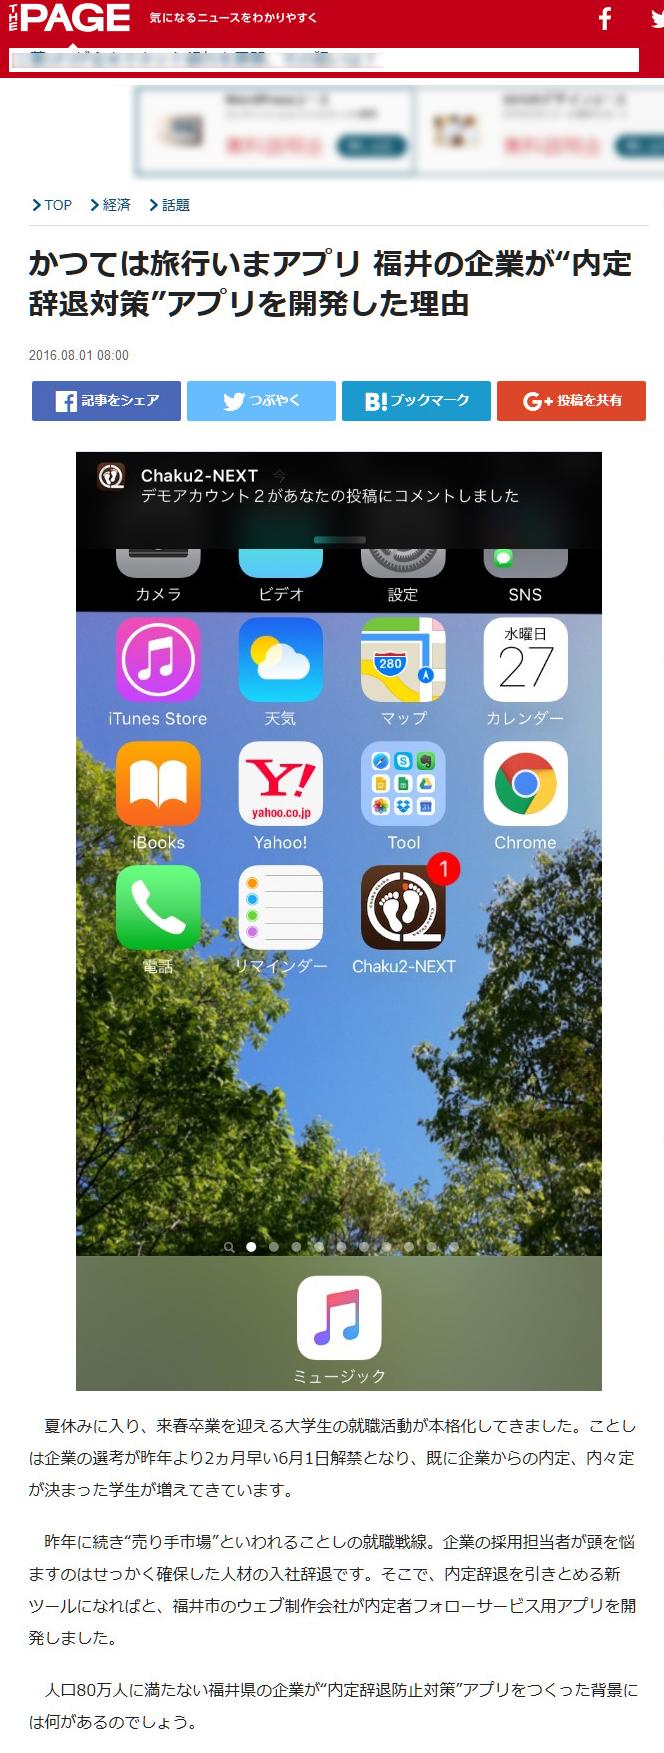 "THE PAGE 「かつては旅行いまアプリ 福井の企業が""内定辞退対策""アプリを開発した理由」"